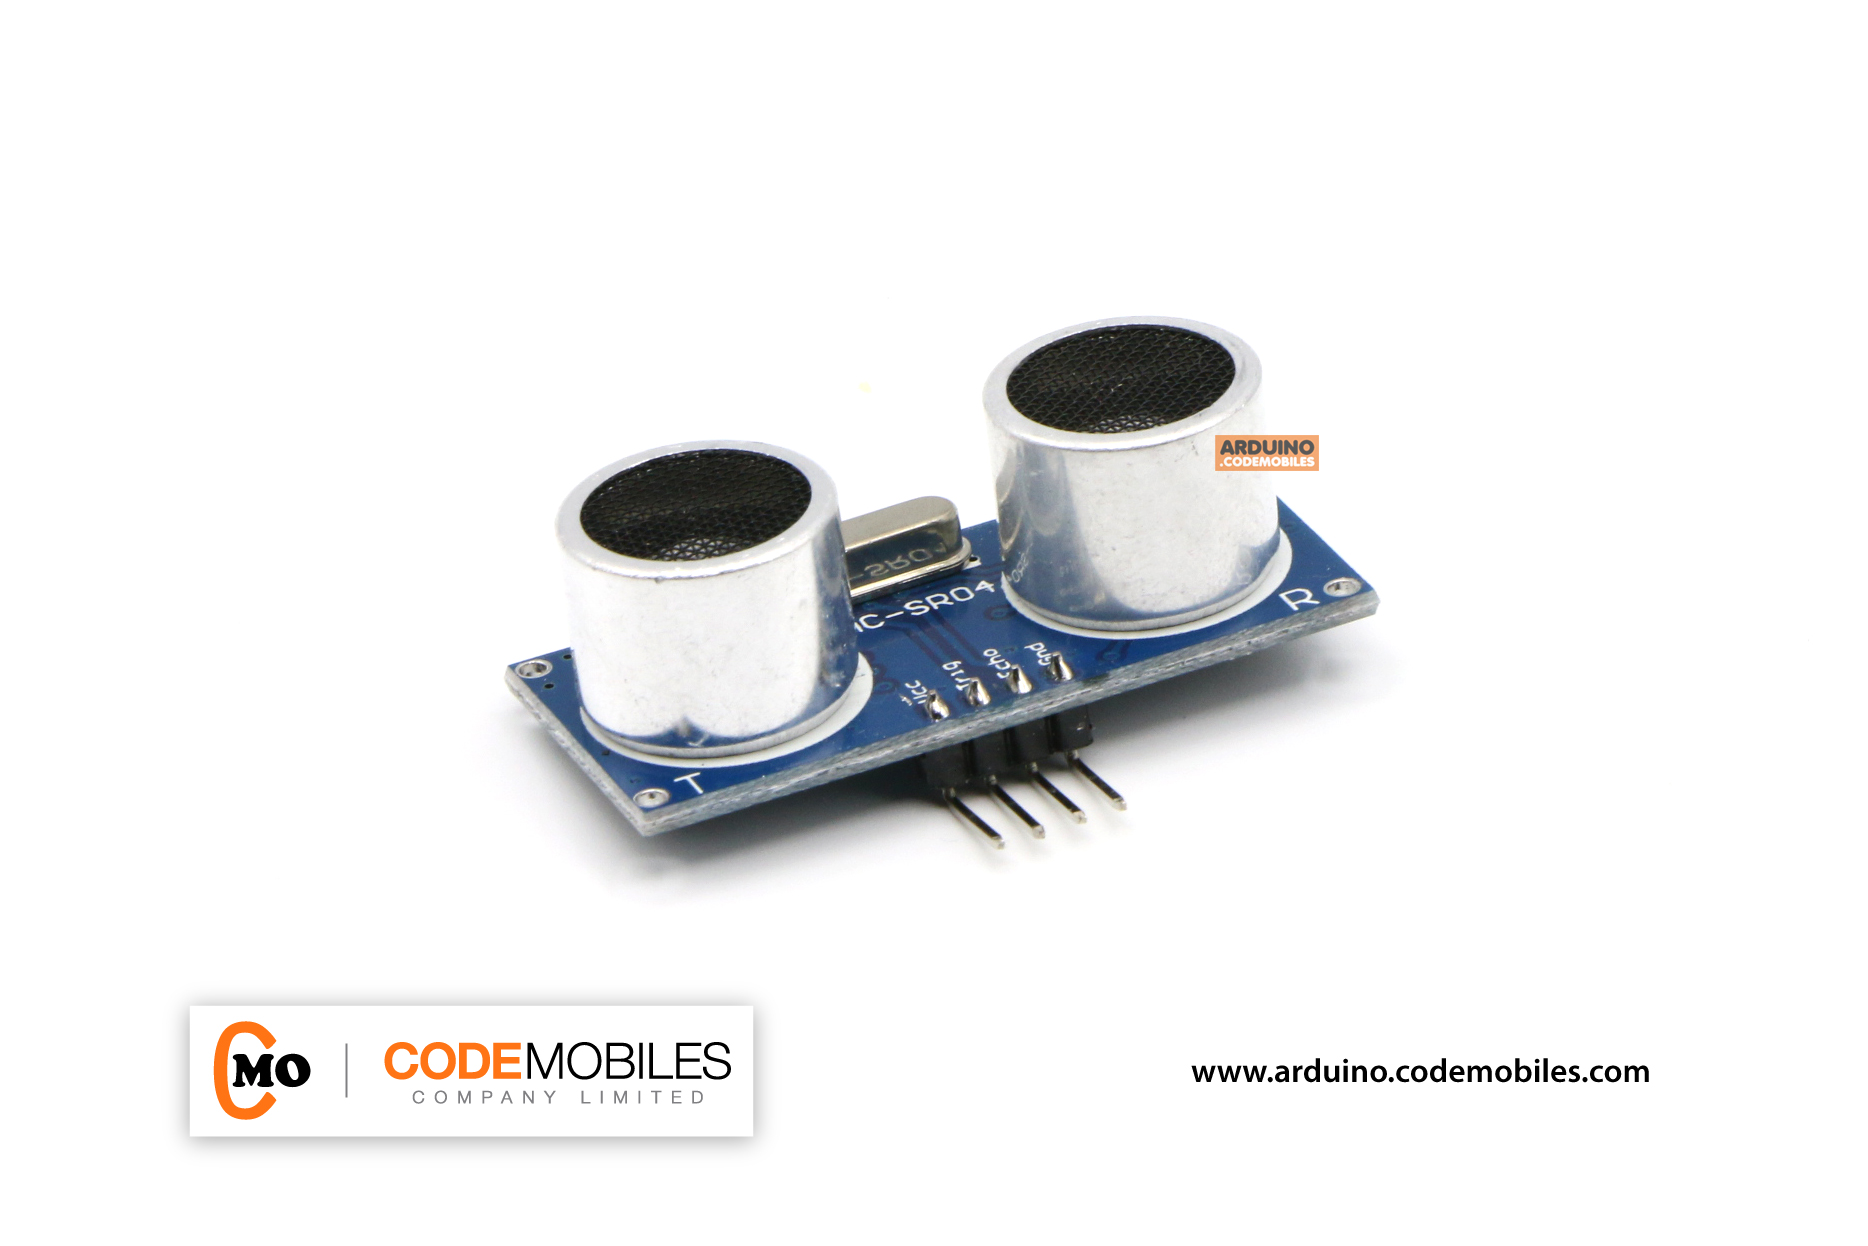 Ultrasonic Distance Sensor (HC-SR04)